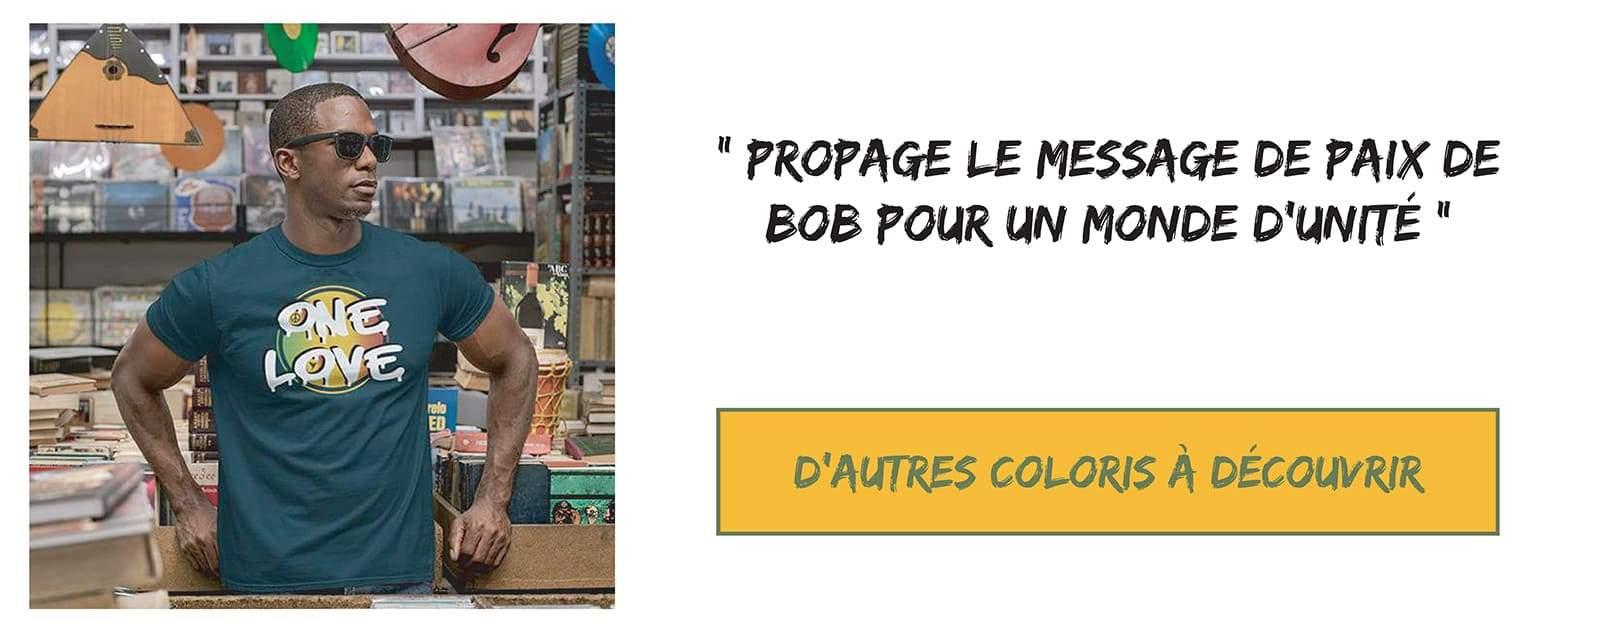 tee shirt rastafari one love, celebre message de bob marley